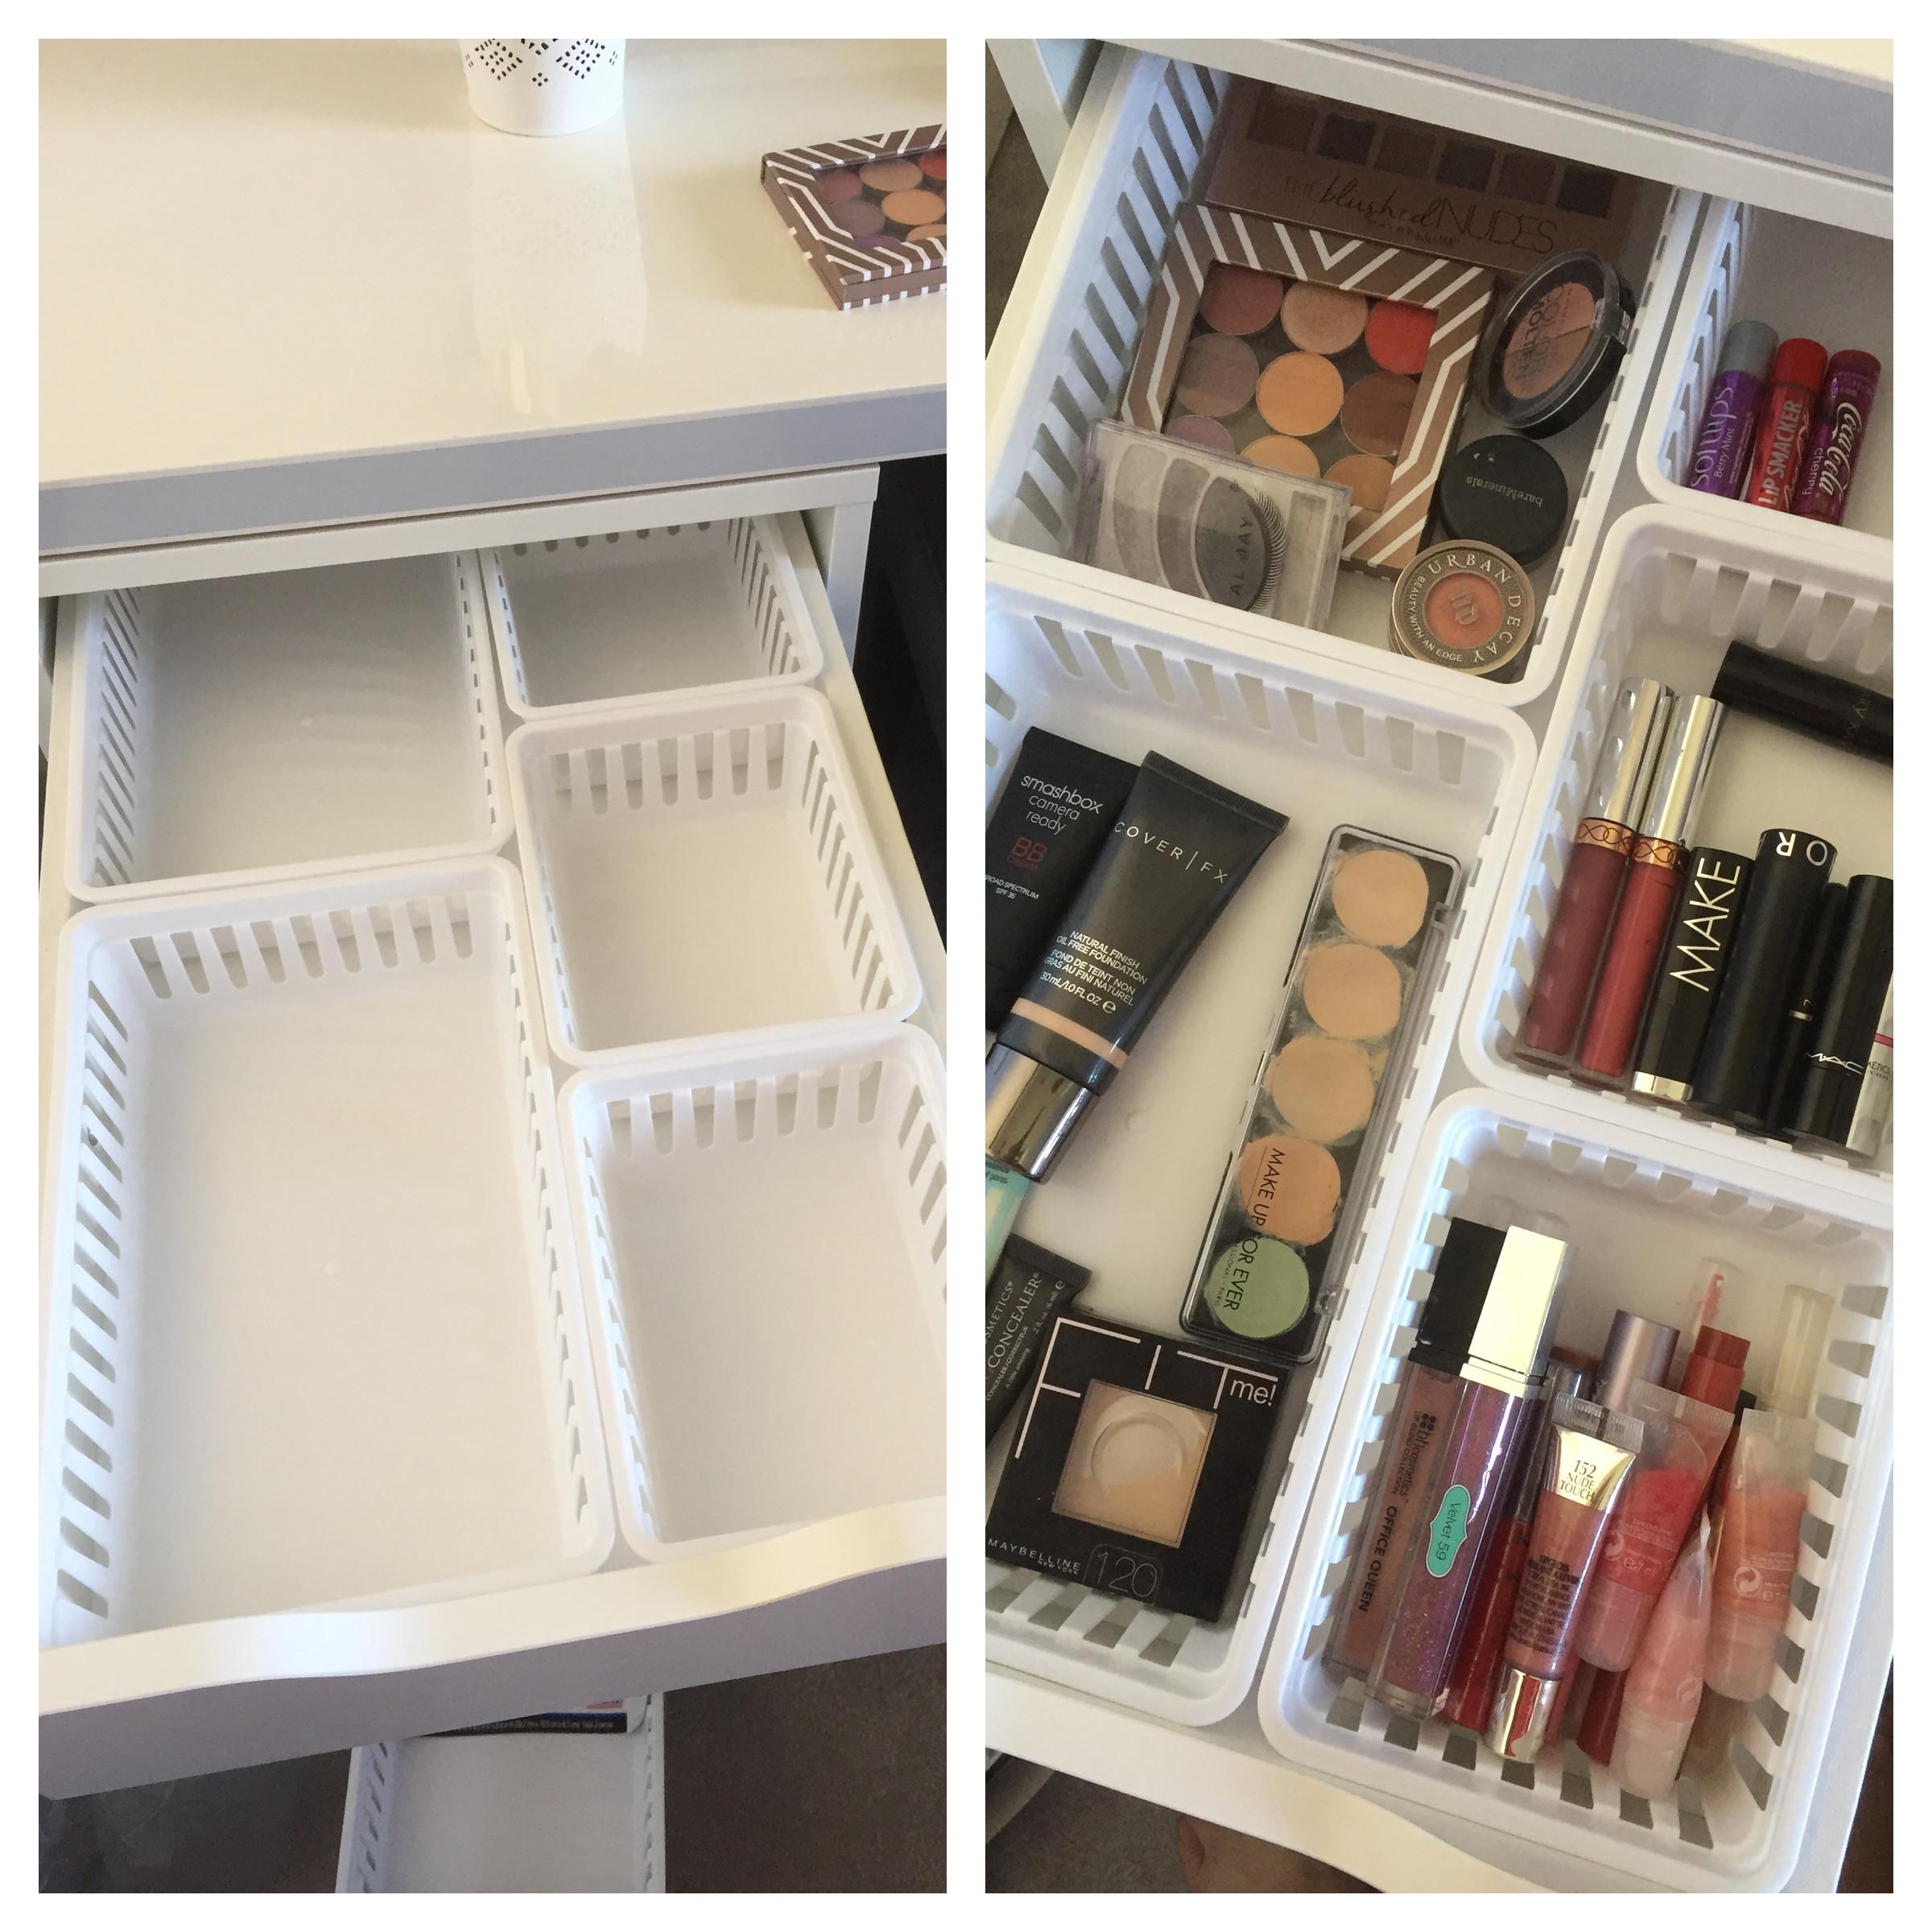 alex drawers dupe ikea lipstick holder ikea makeup organizer